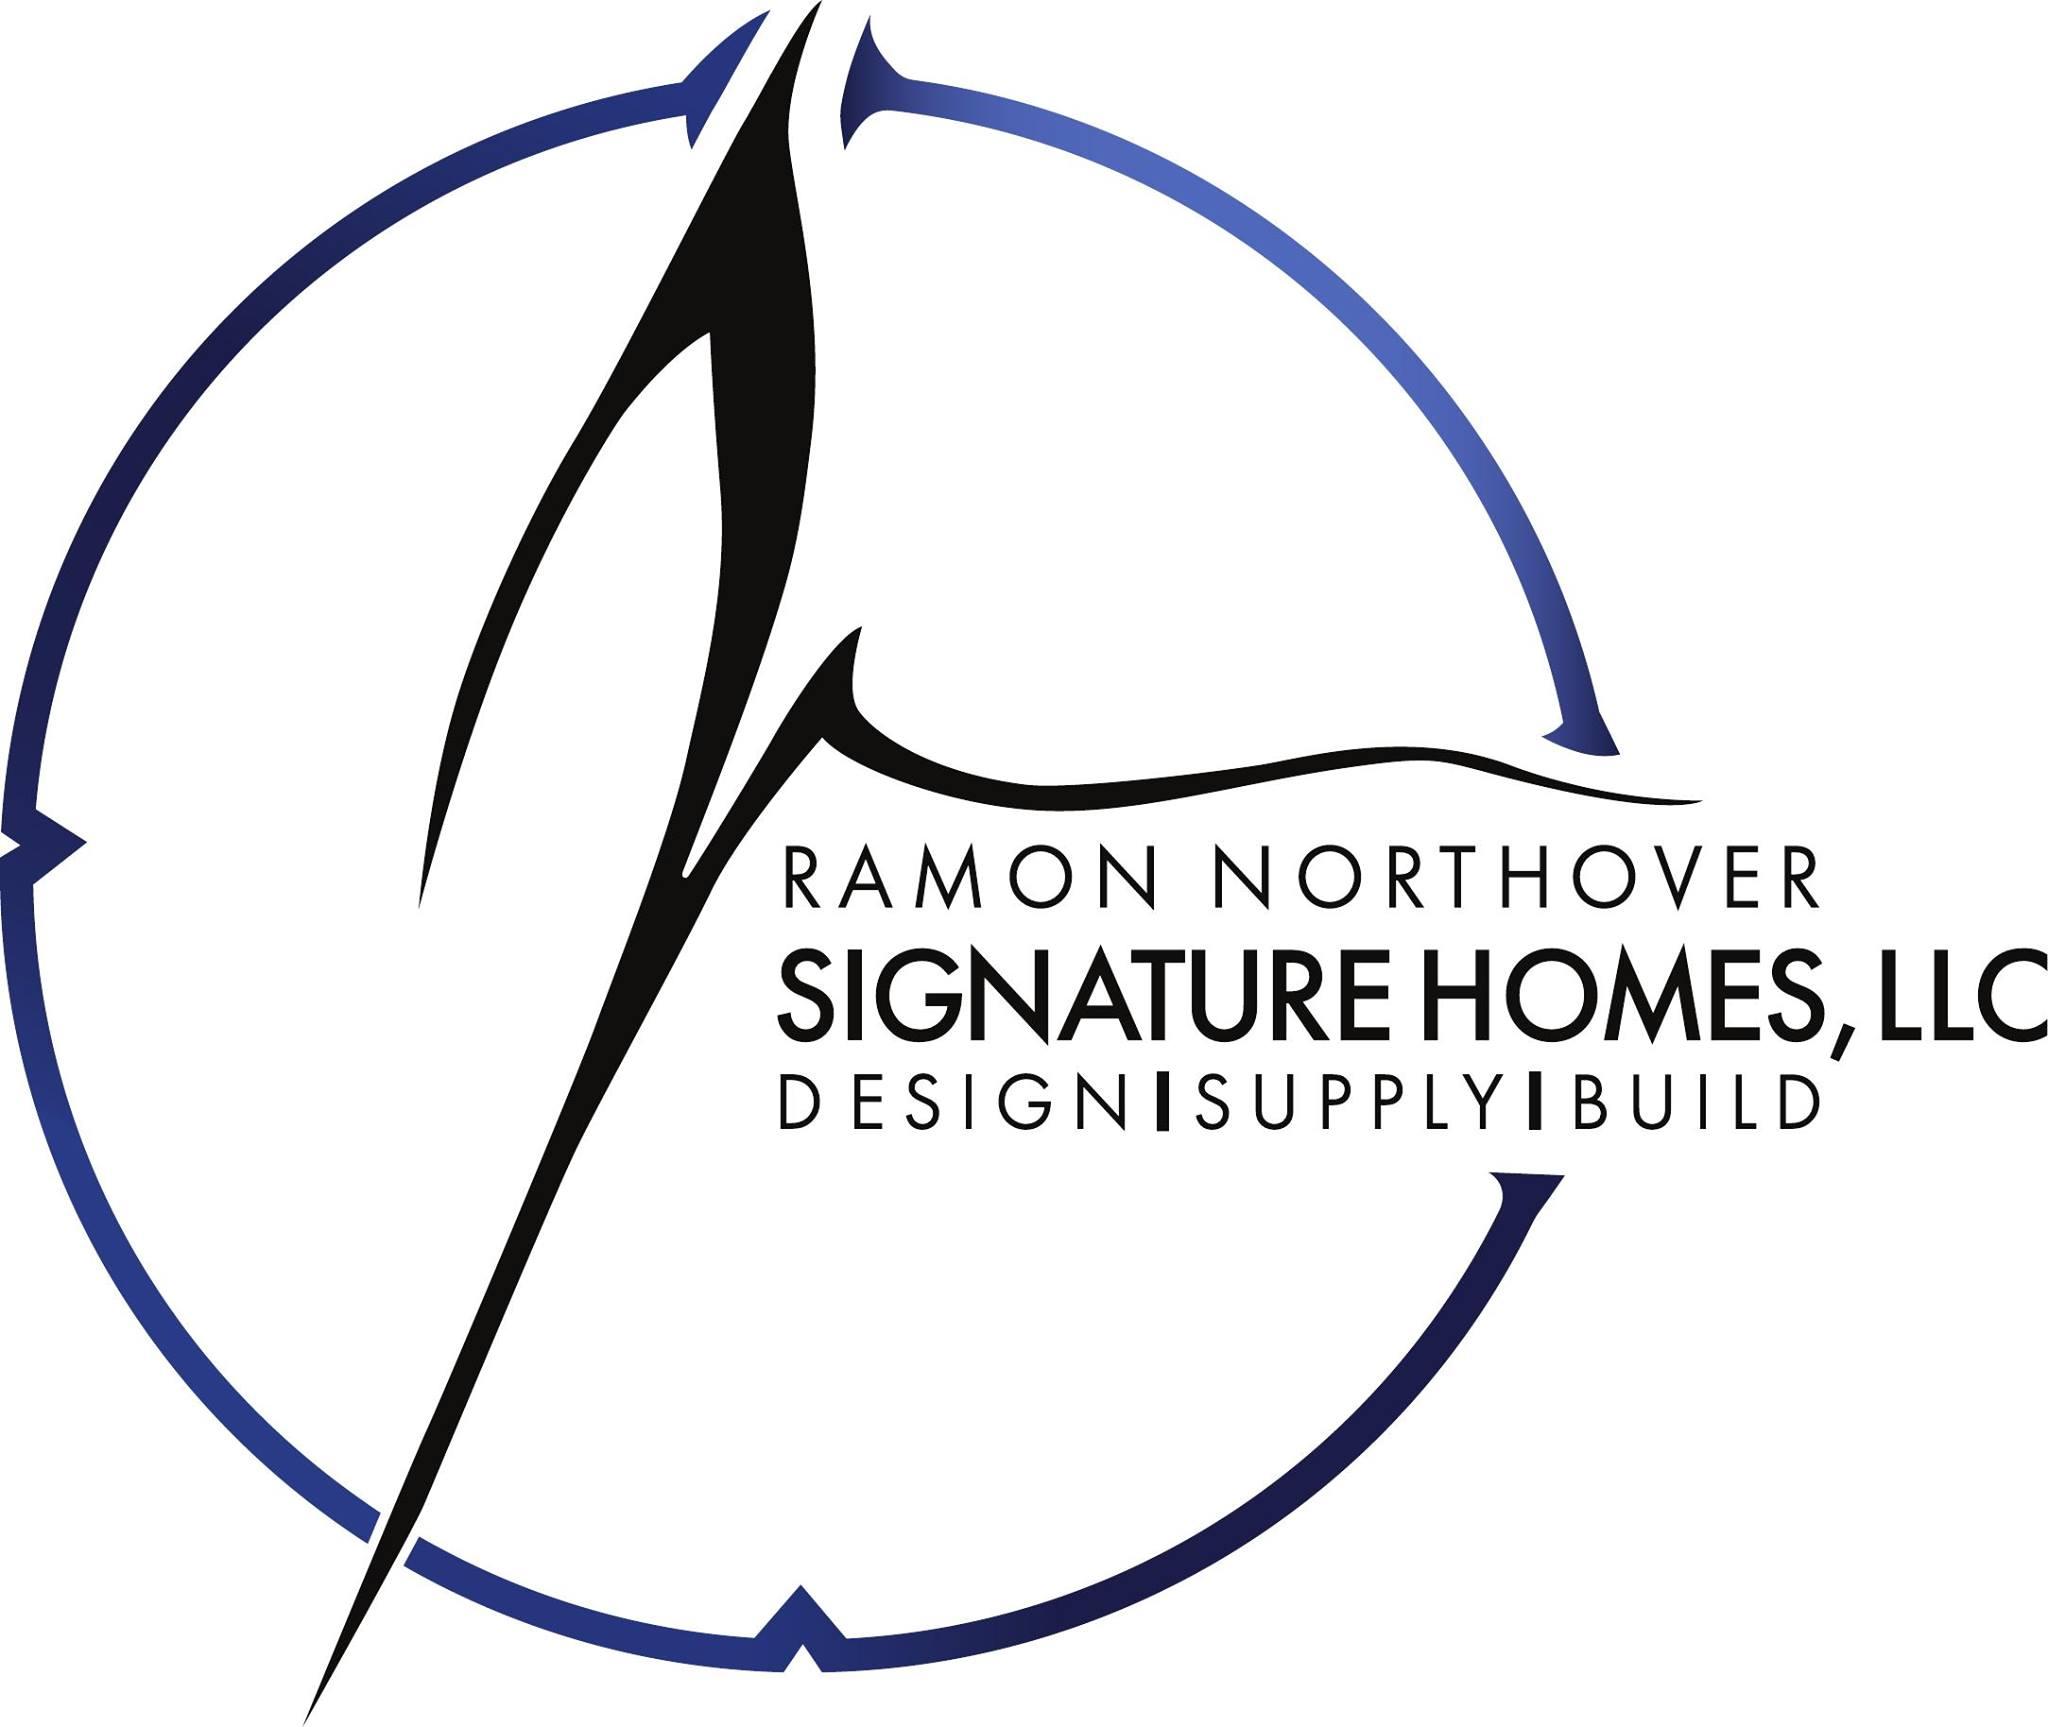 Ramon Northover